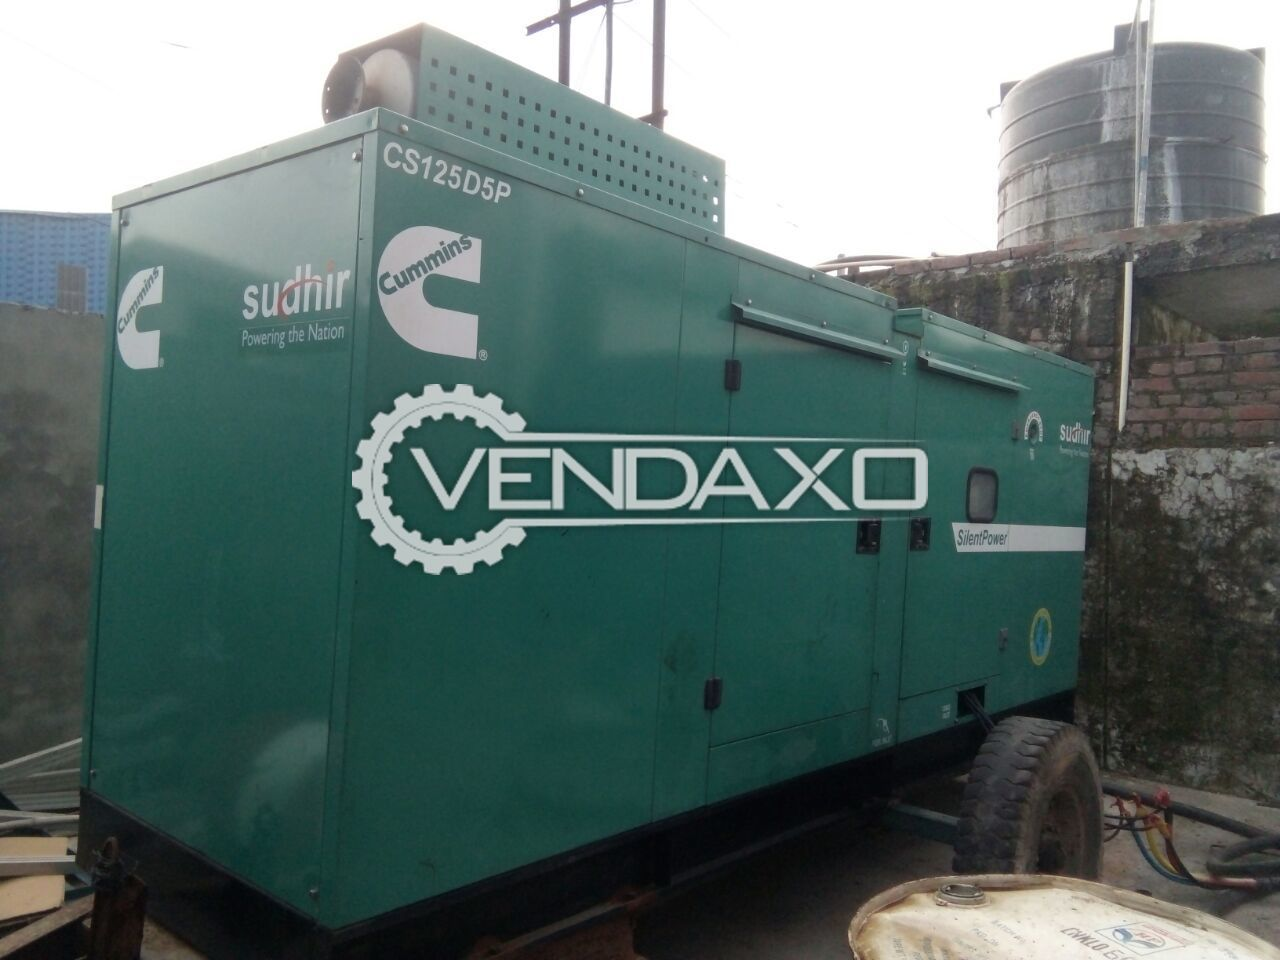 CUMMINS - Sudhir Diesel Generator - 125 Kva